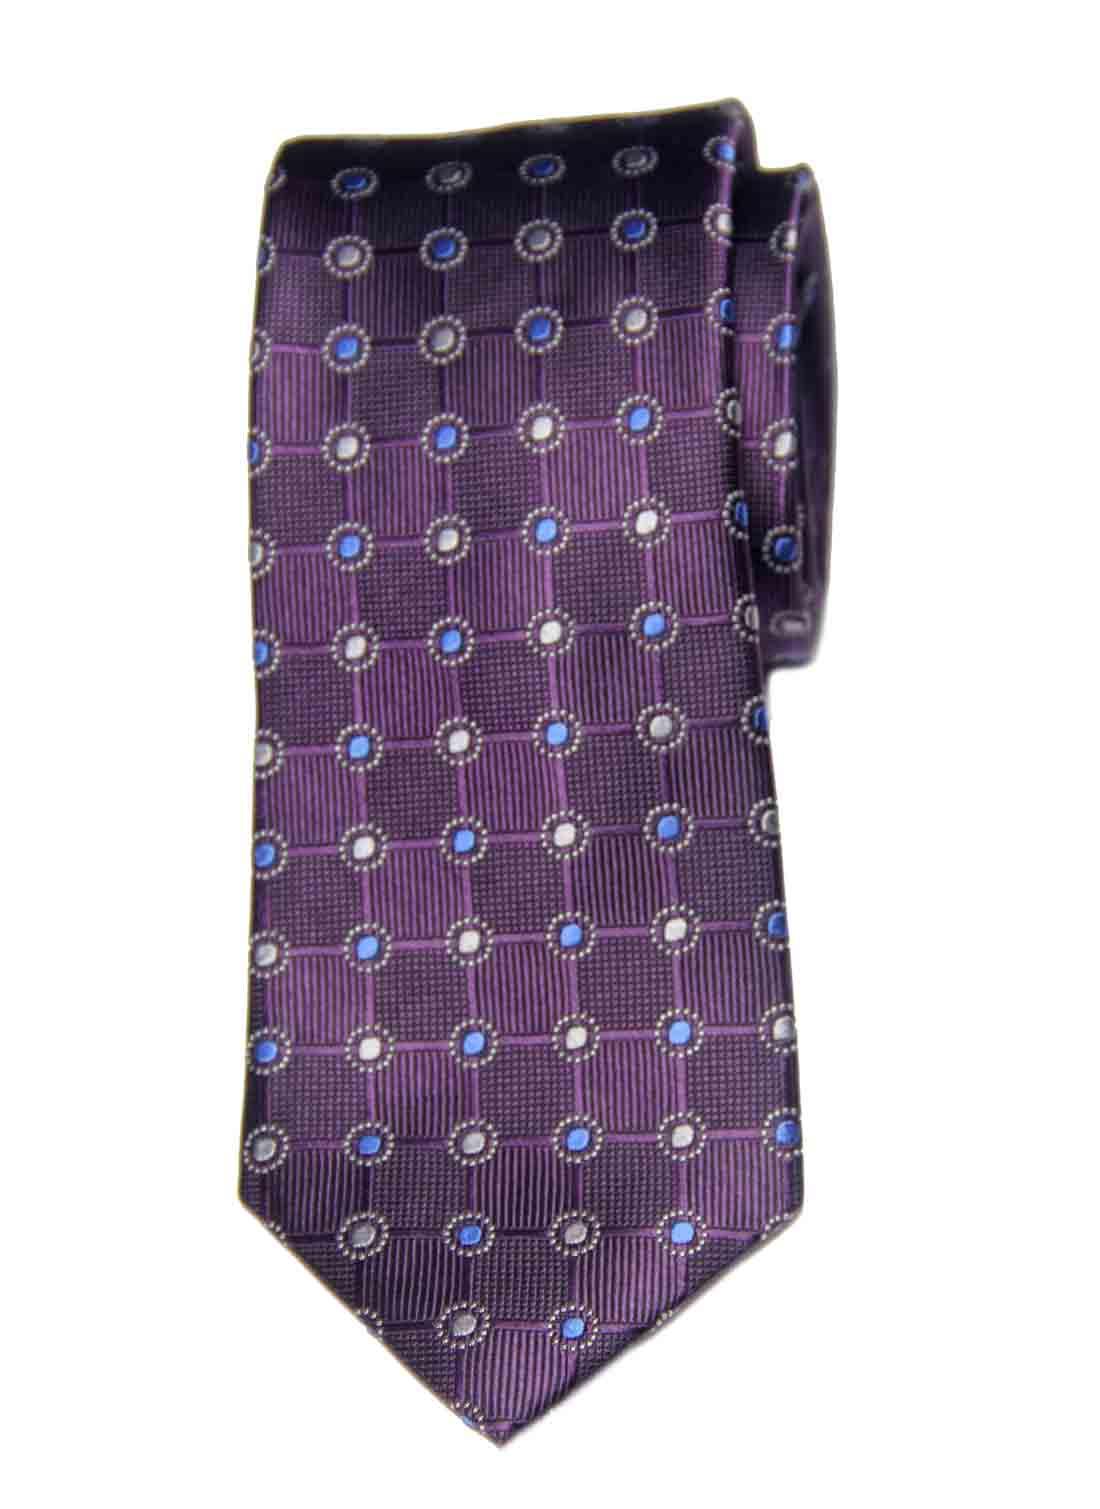 Jos A Bank Executive Collection Silk Tie Purple Blue Gray Geometric Men's